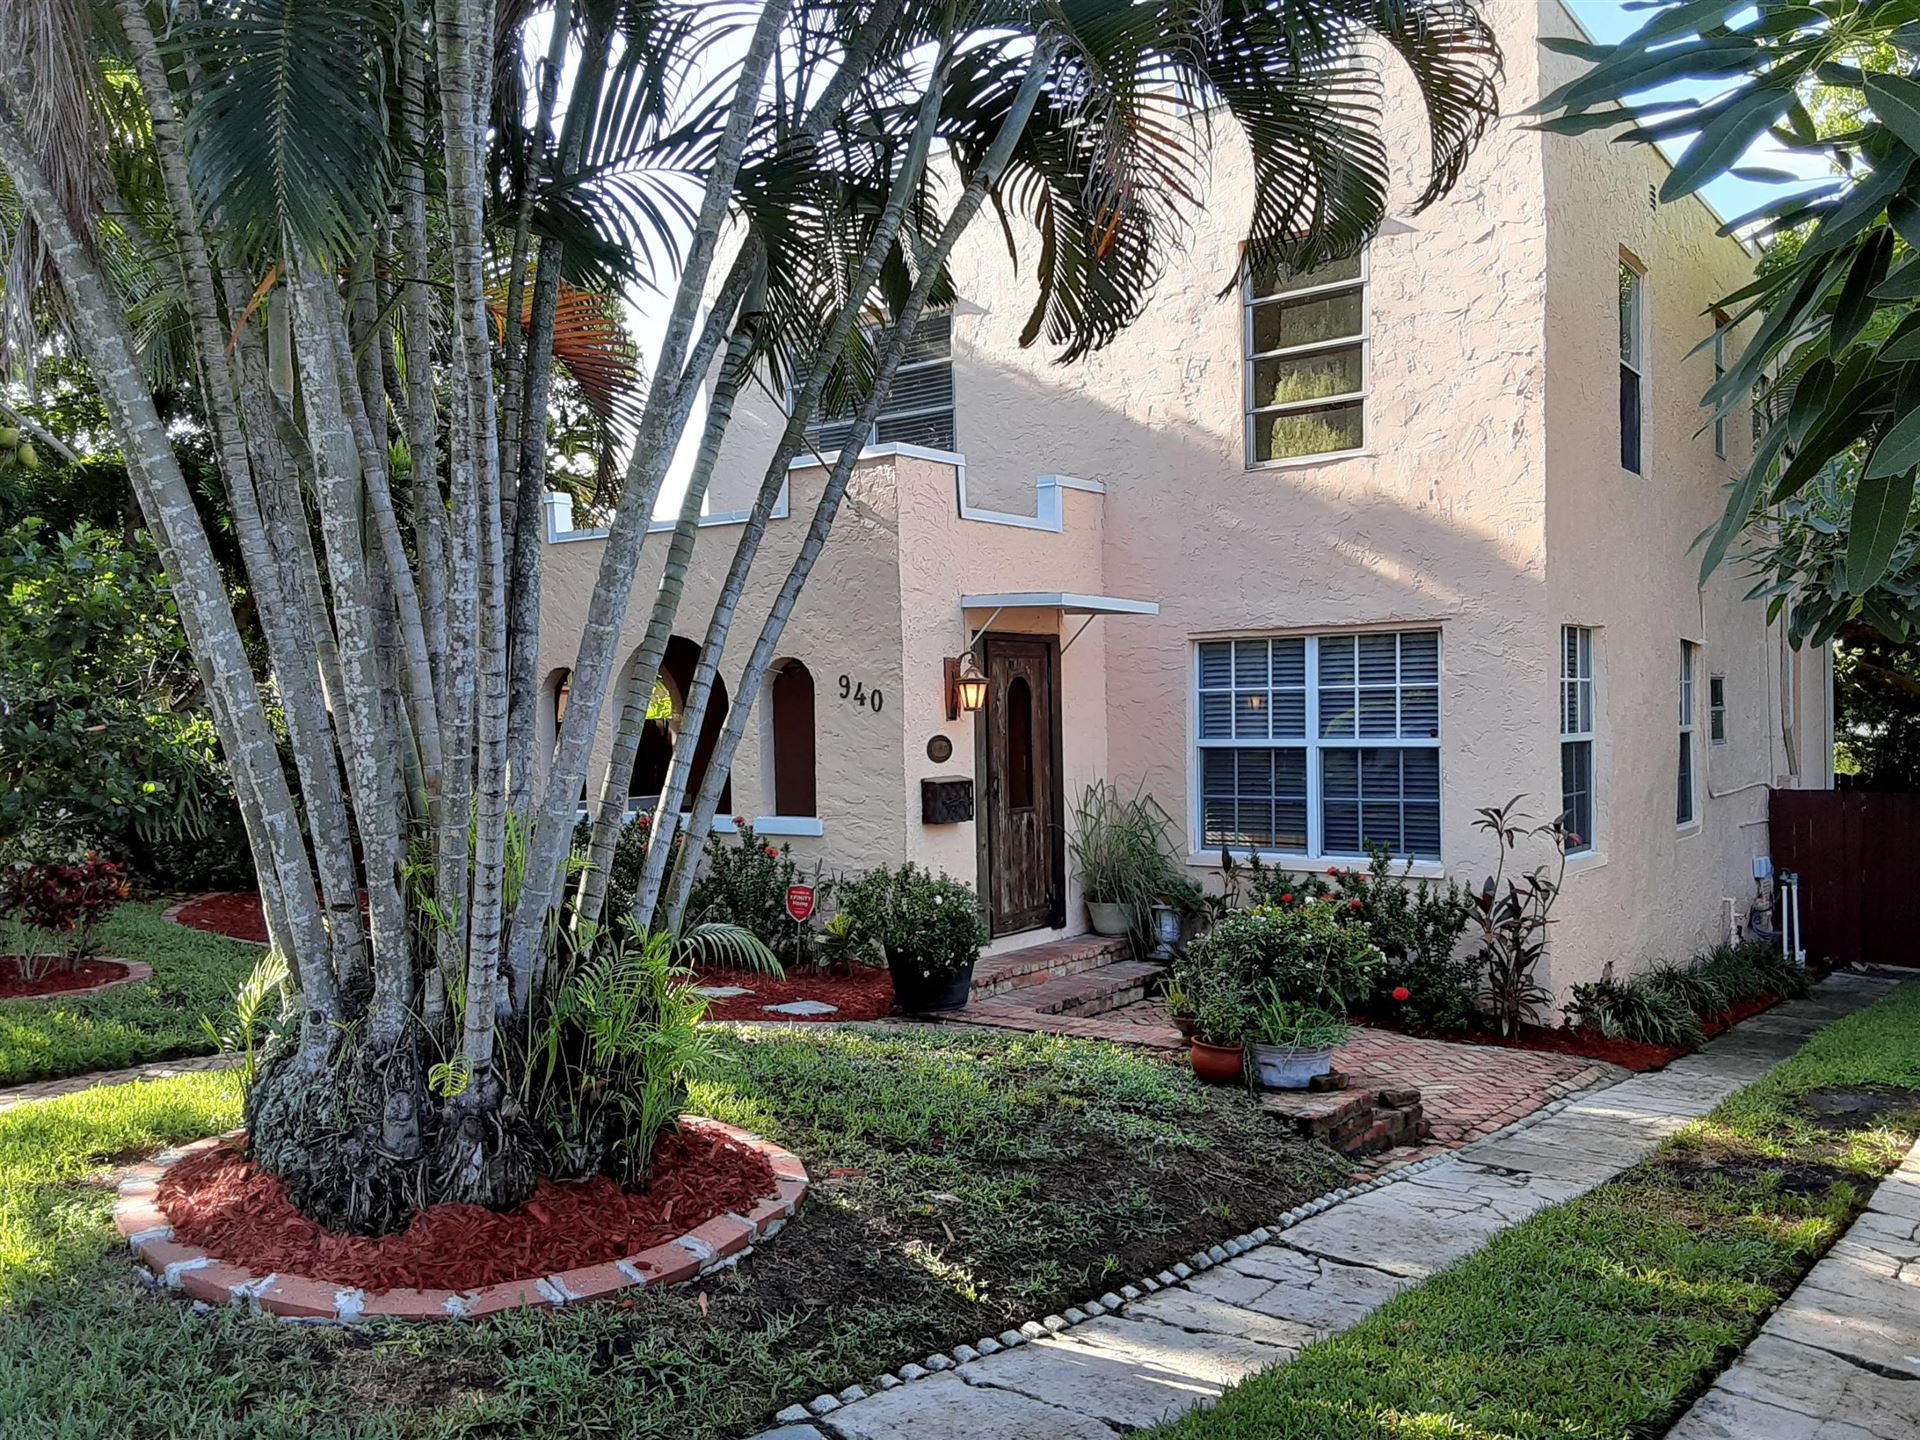 940 39th Court, West Palm Beach, FL 33407 - #: RX-10733828